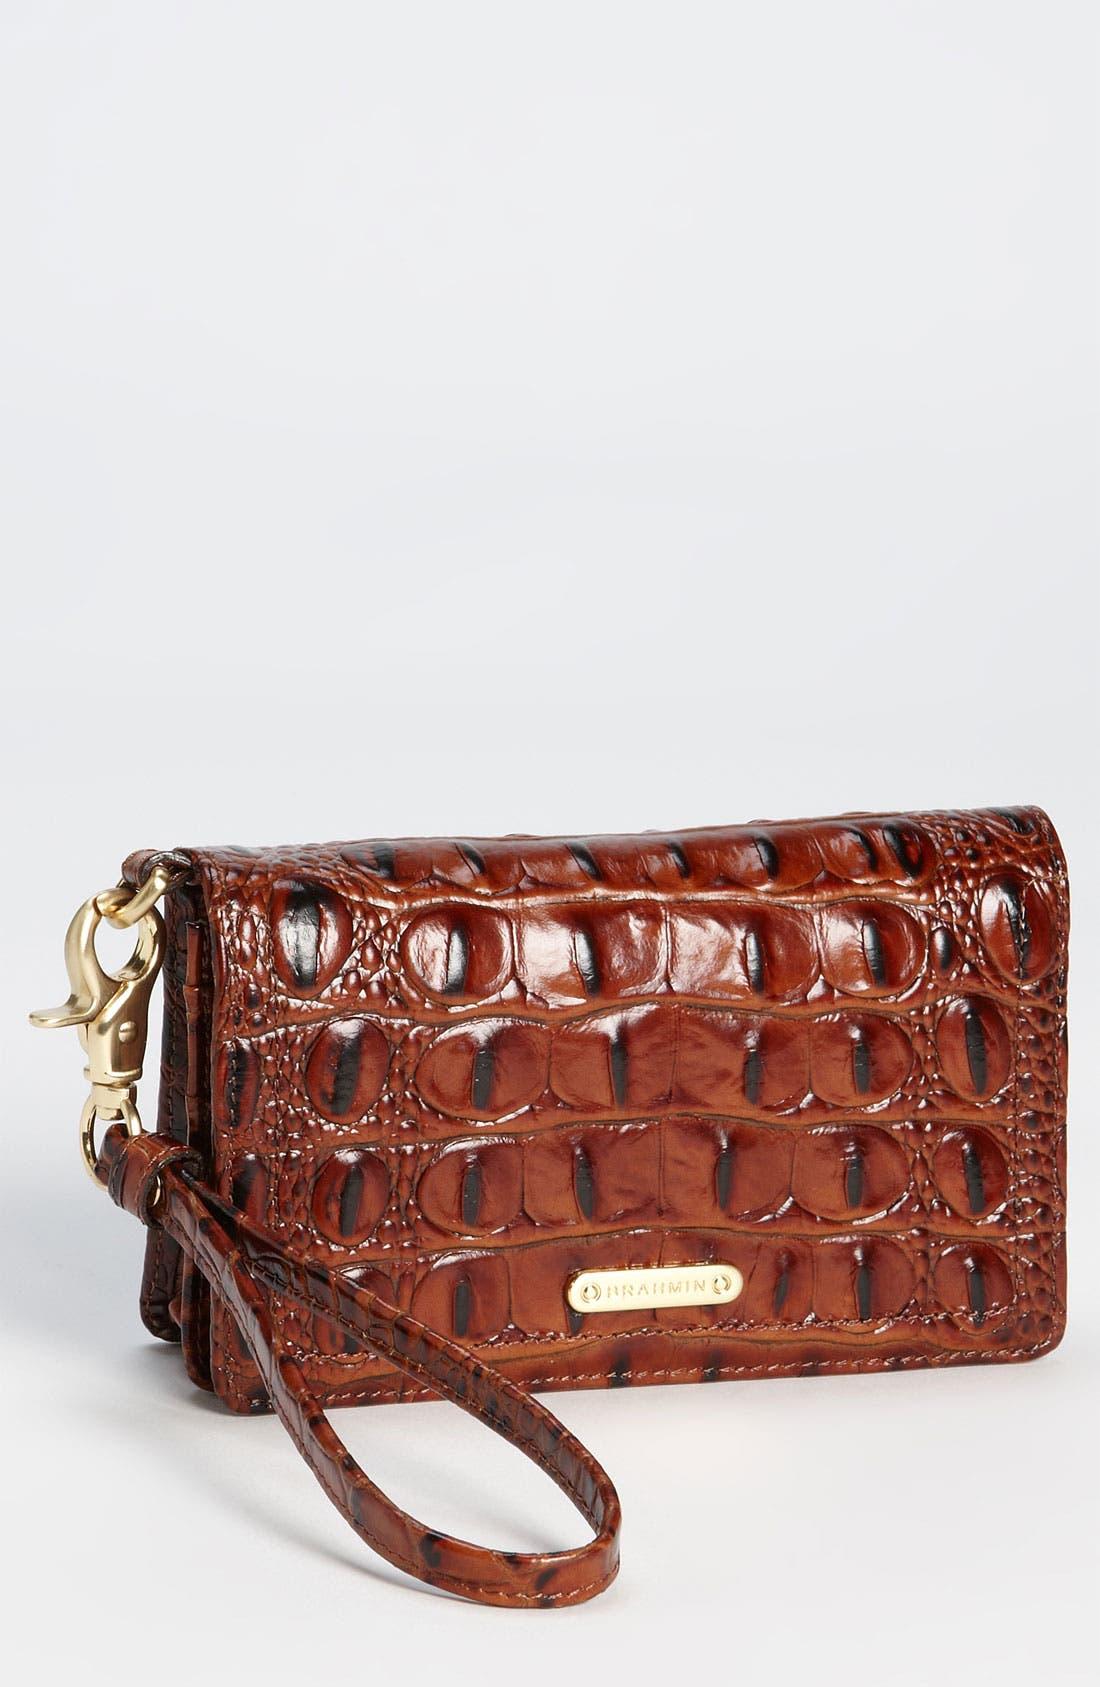 Main Image - Brahmin 'Debi' Croc Embossed Leather Wristlet